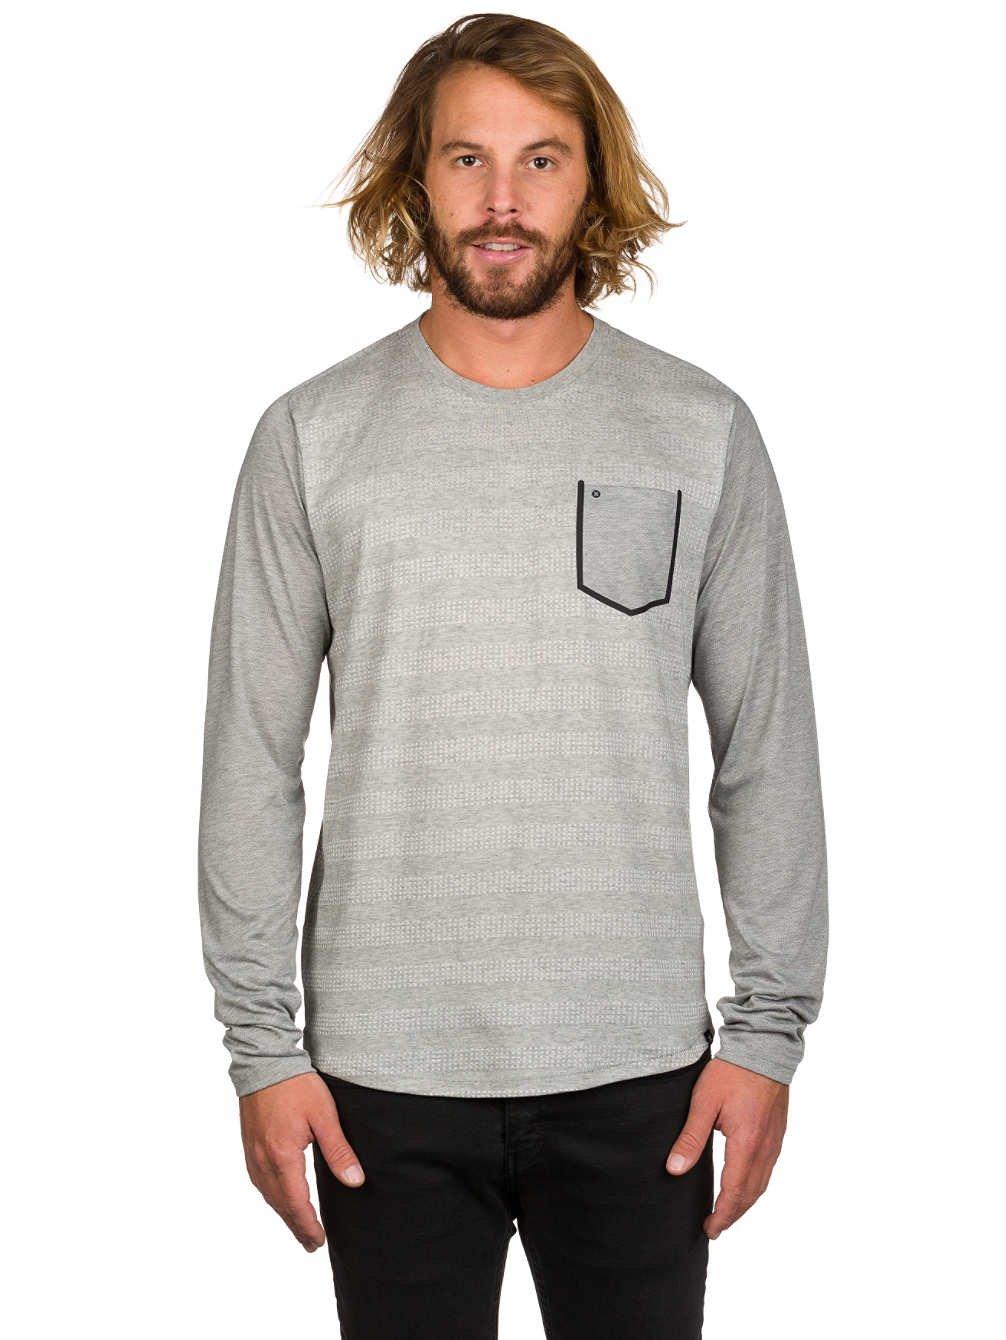 Longsleeve Men Hurley Dri-Fit Flow 2.0 Crew T-Shirt LS: Amazon.co.uk:  Clothing